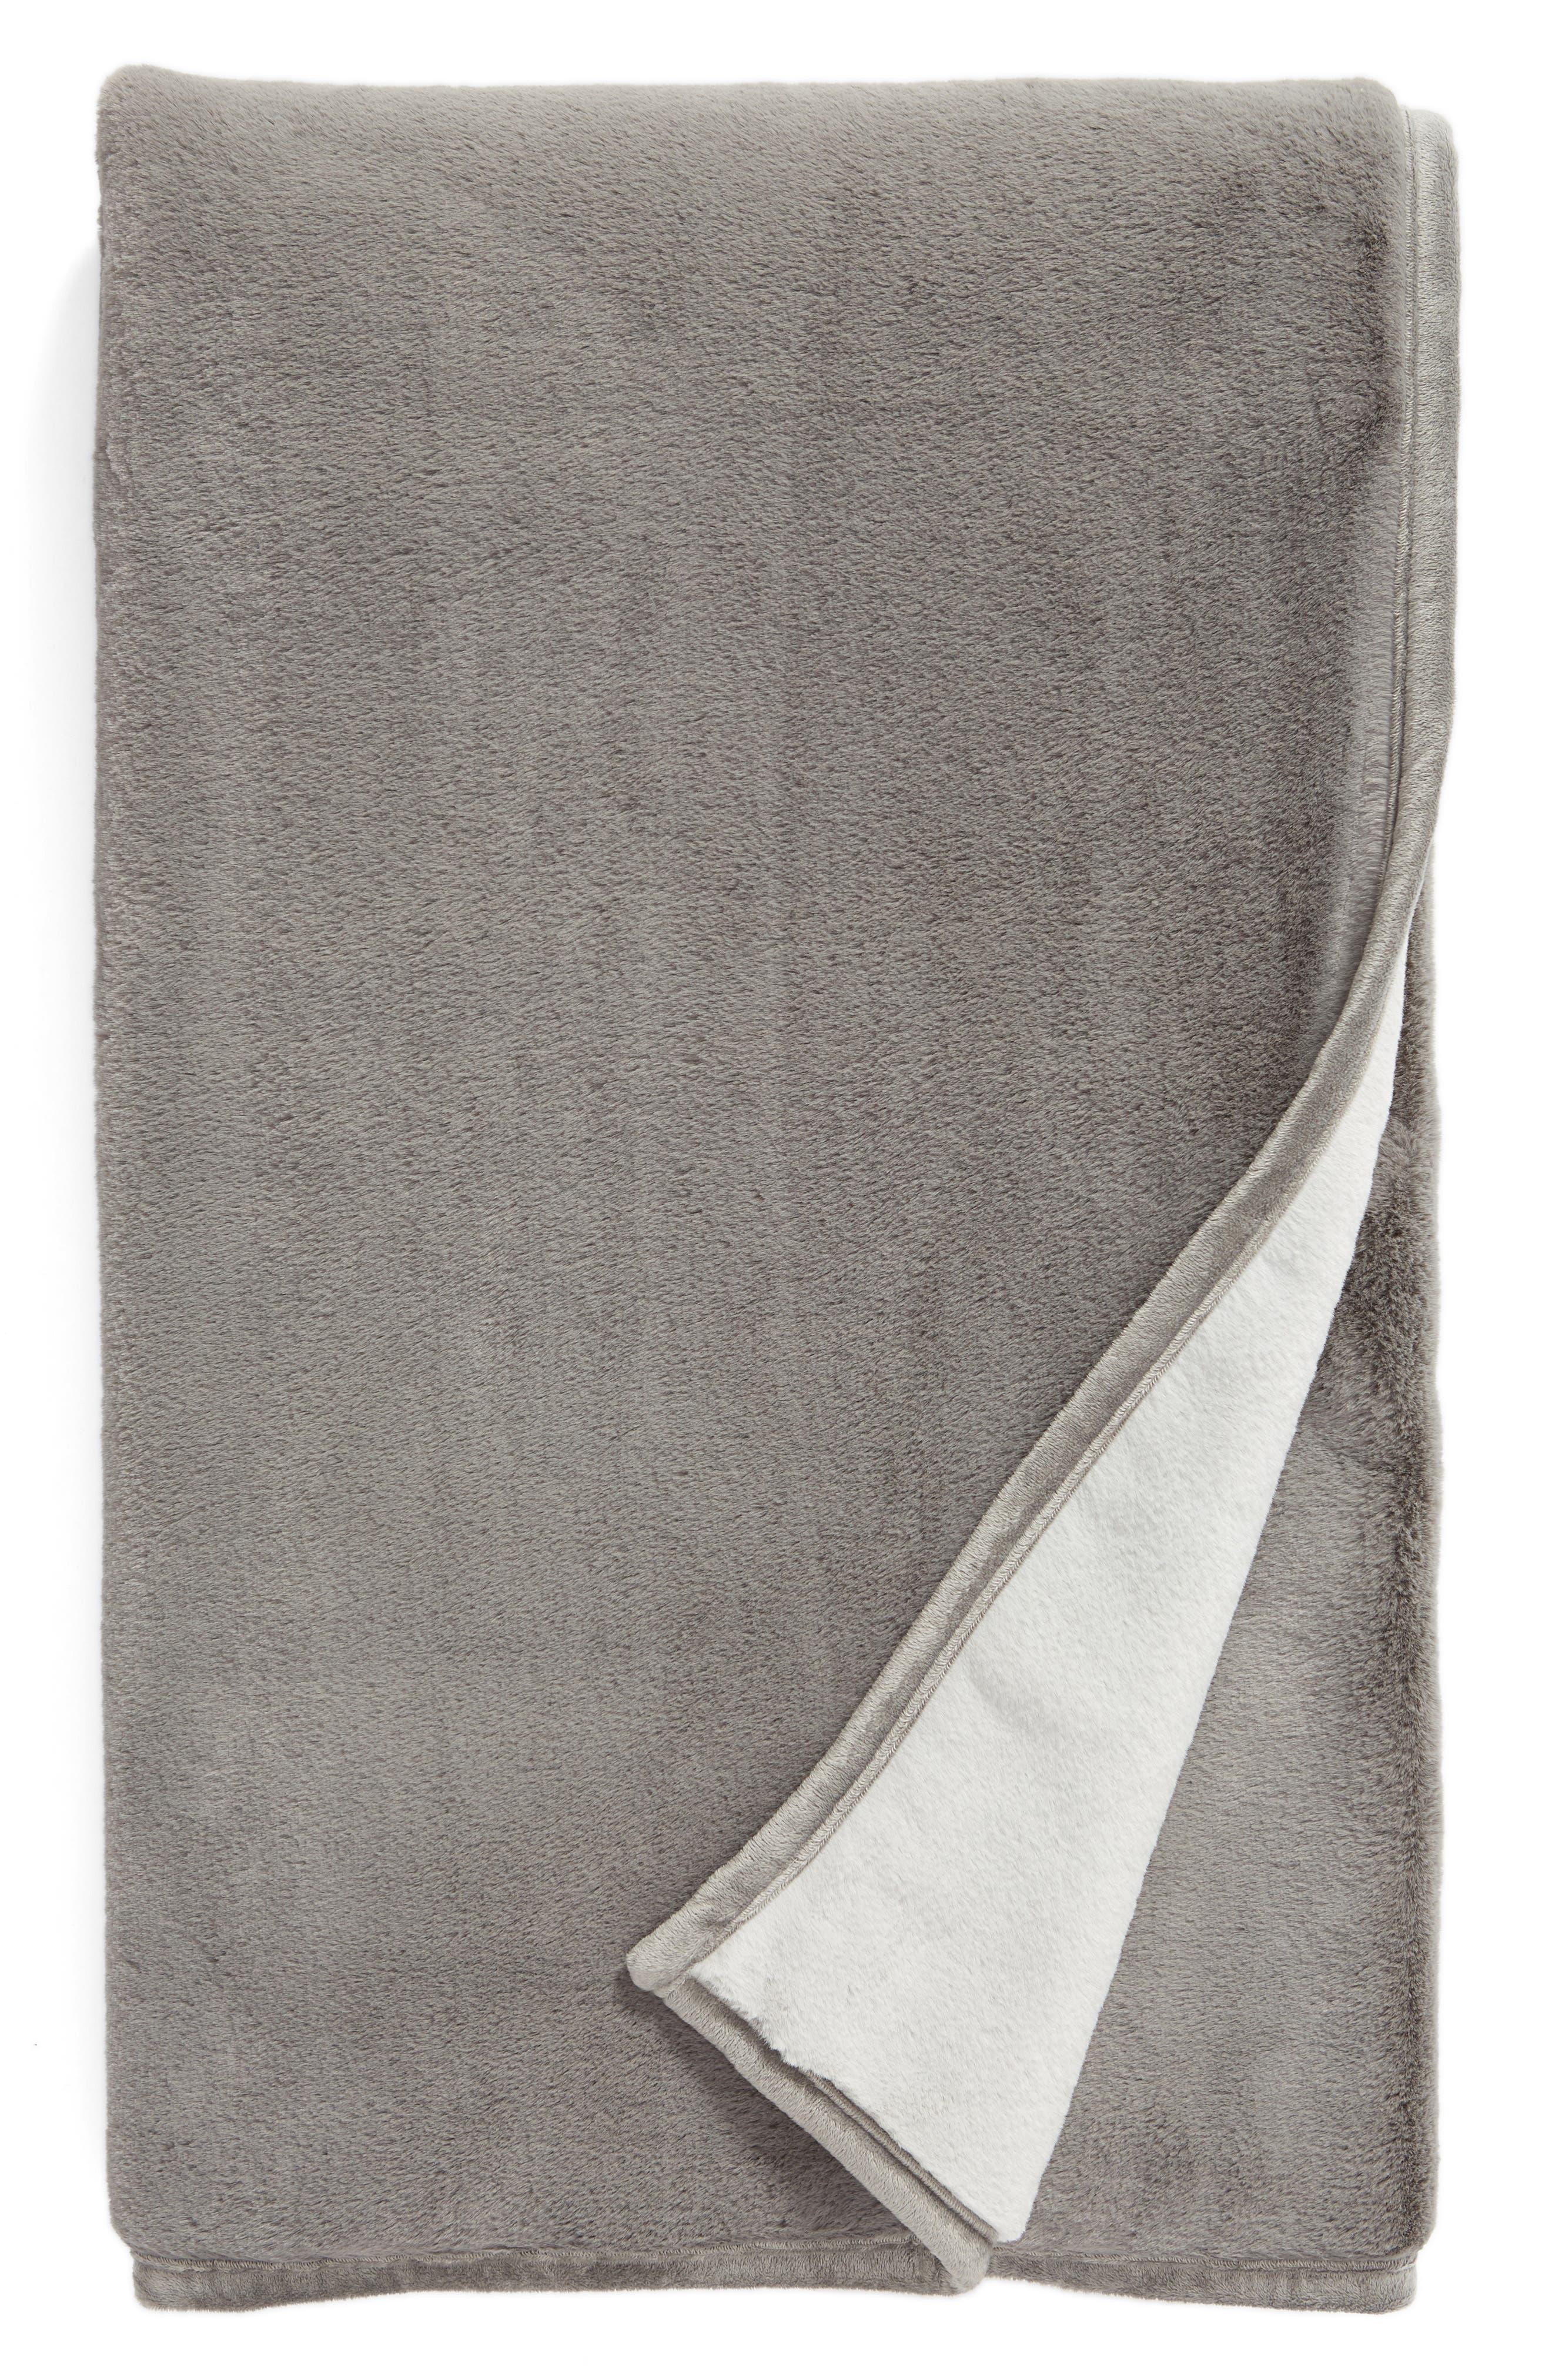 Reversible Plush Throw Blanket,                             Main thumbnail 1, color,                             GREY FROST